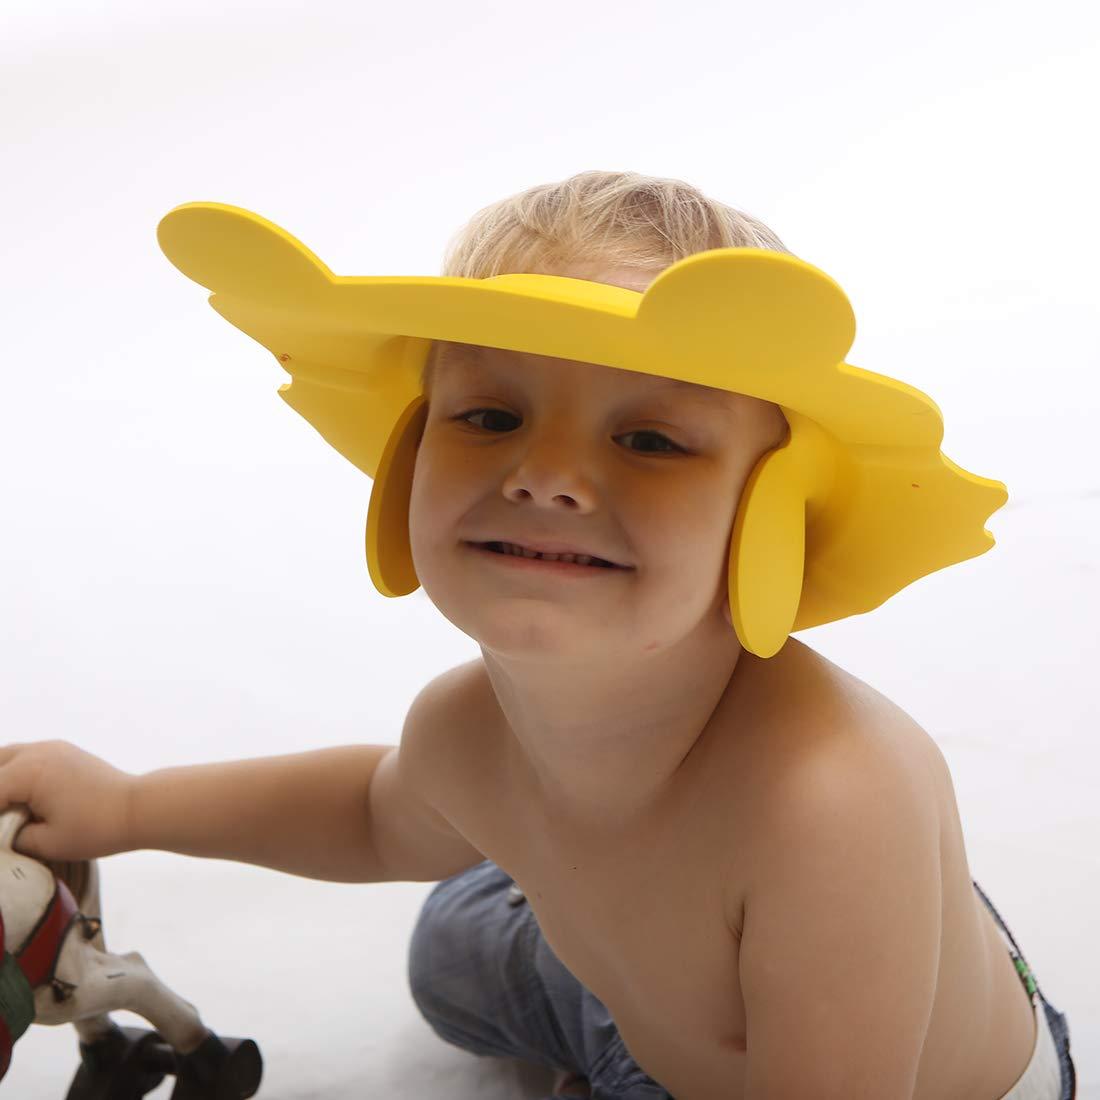 Blue+Pink+Yellow Infants Soft Protection Funny Safety Visor Cap for Toddler Children Baby Shampoo Shower Bathing Cap Adjustable Shower Cap Kids